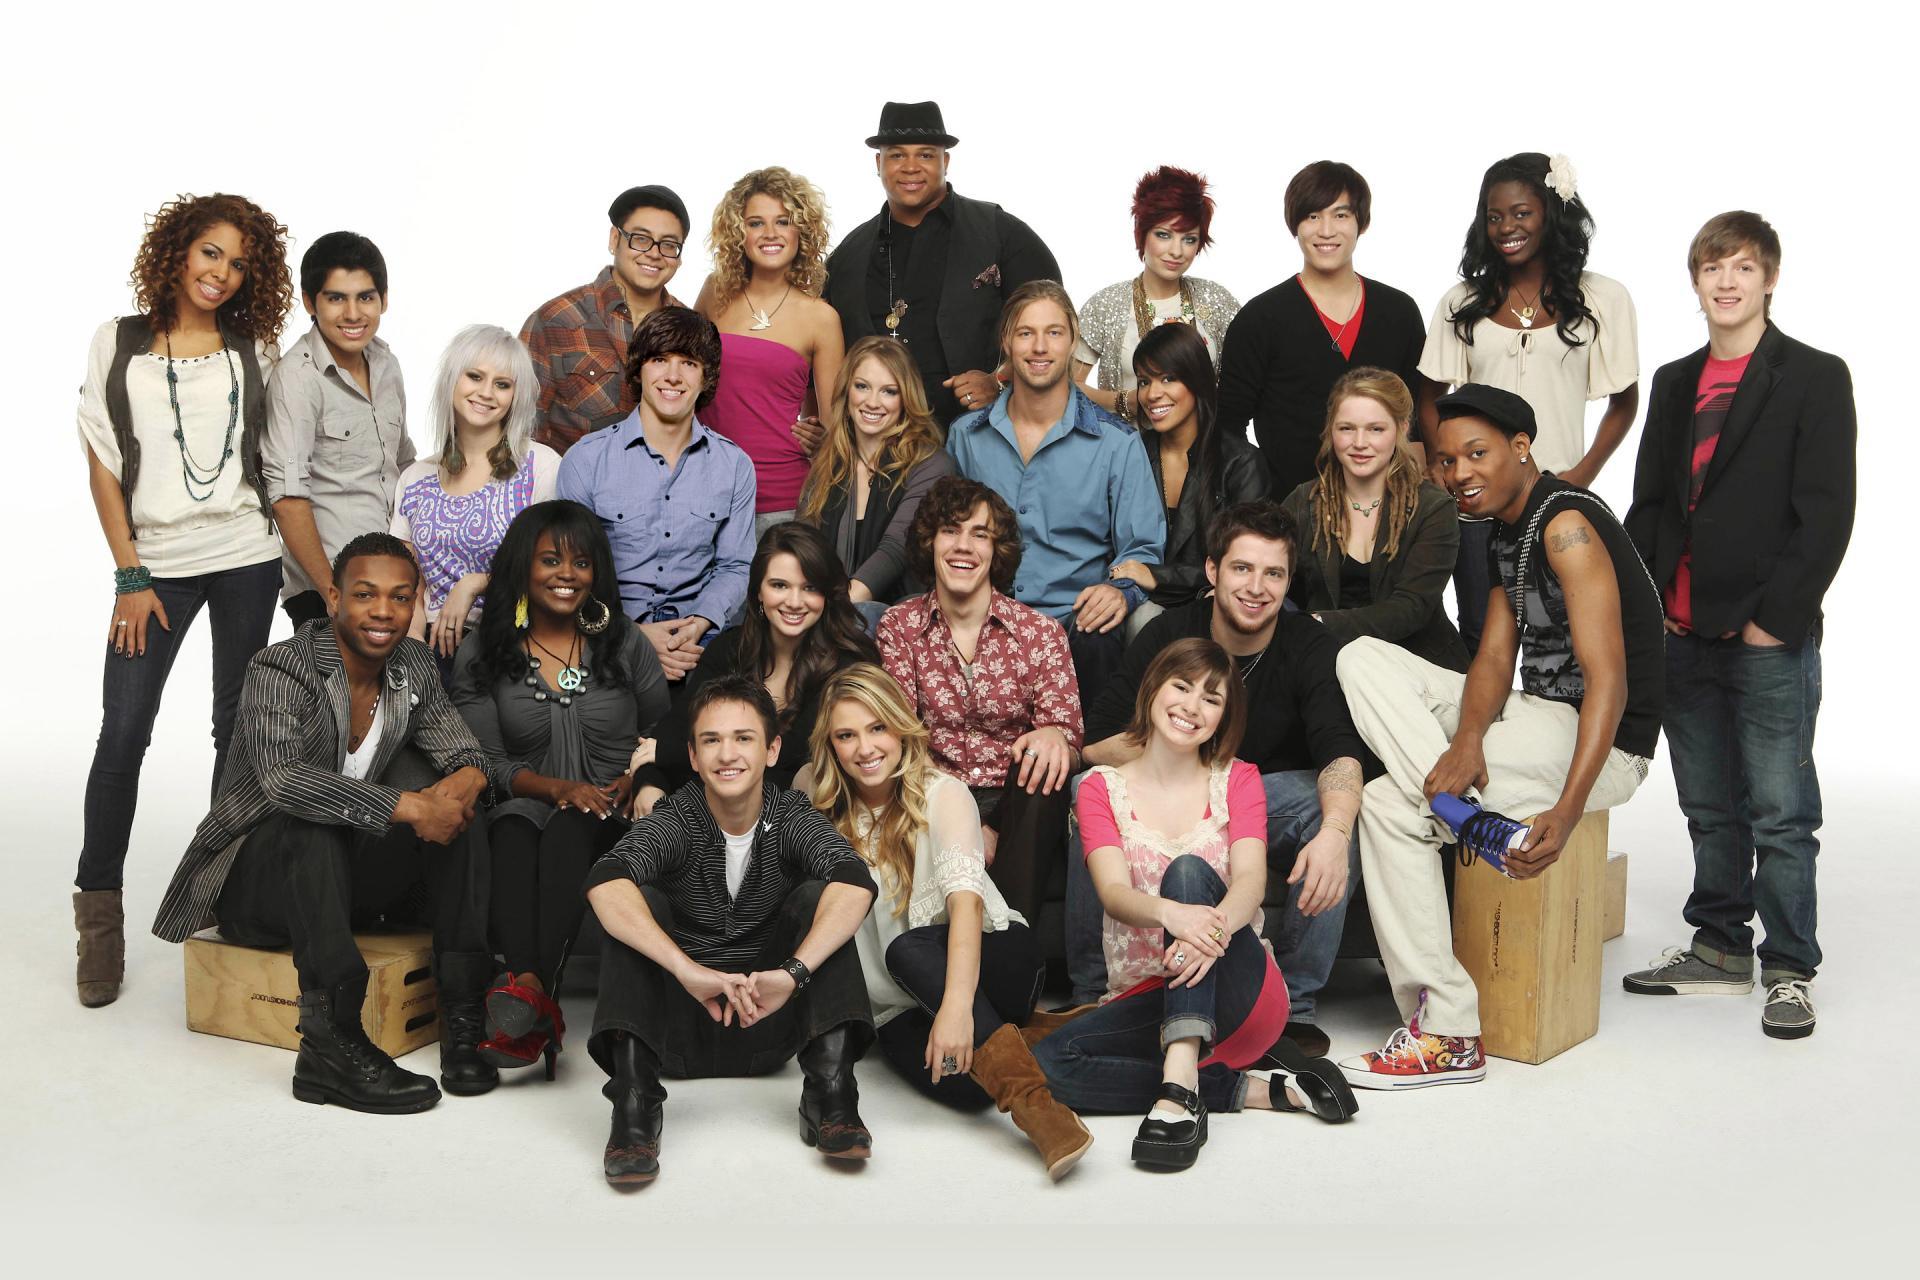 American Idol wallpapers HD quality